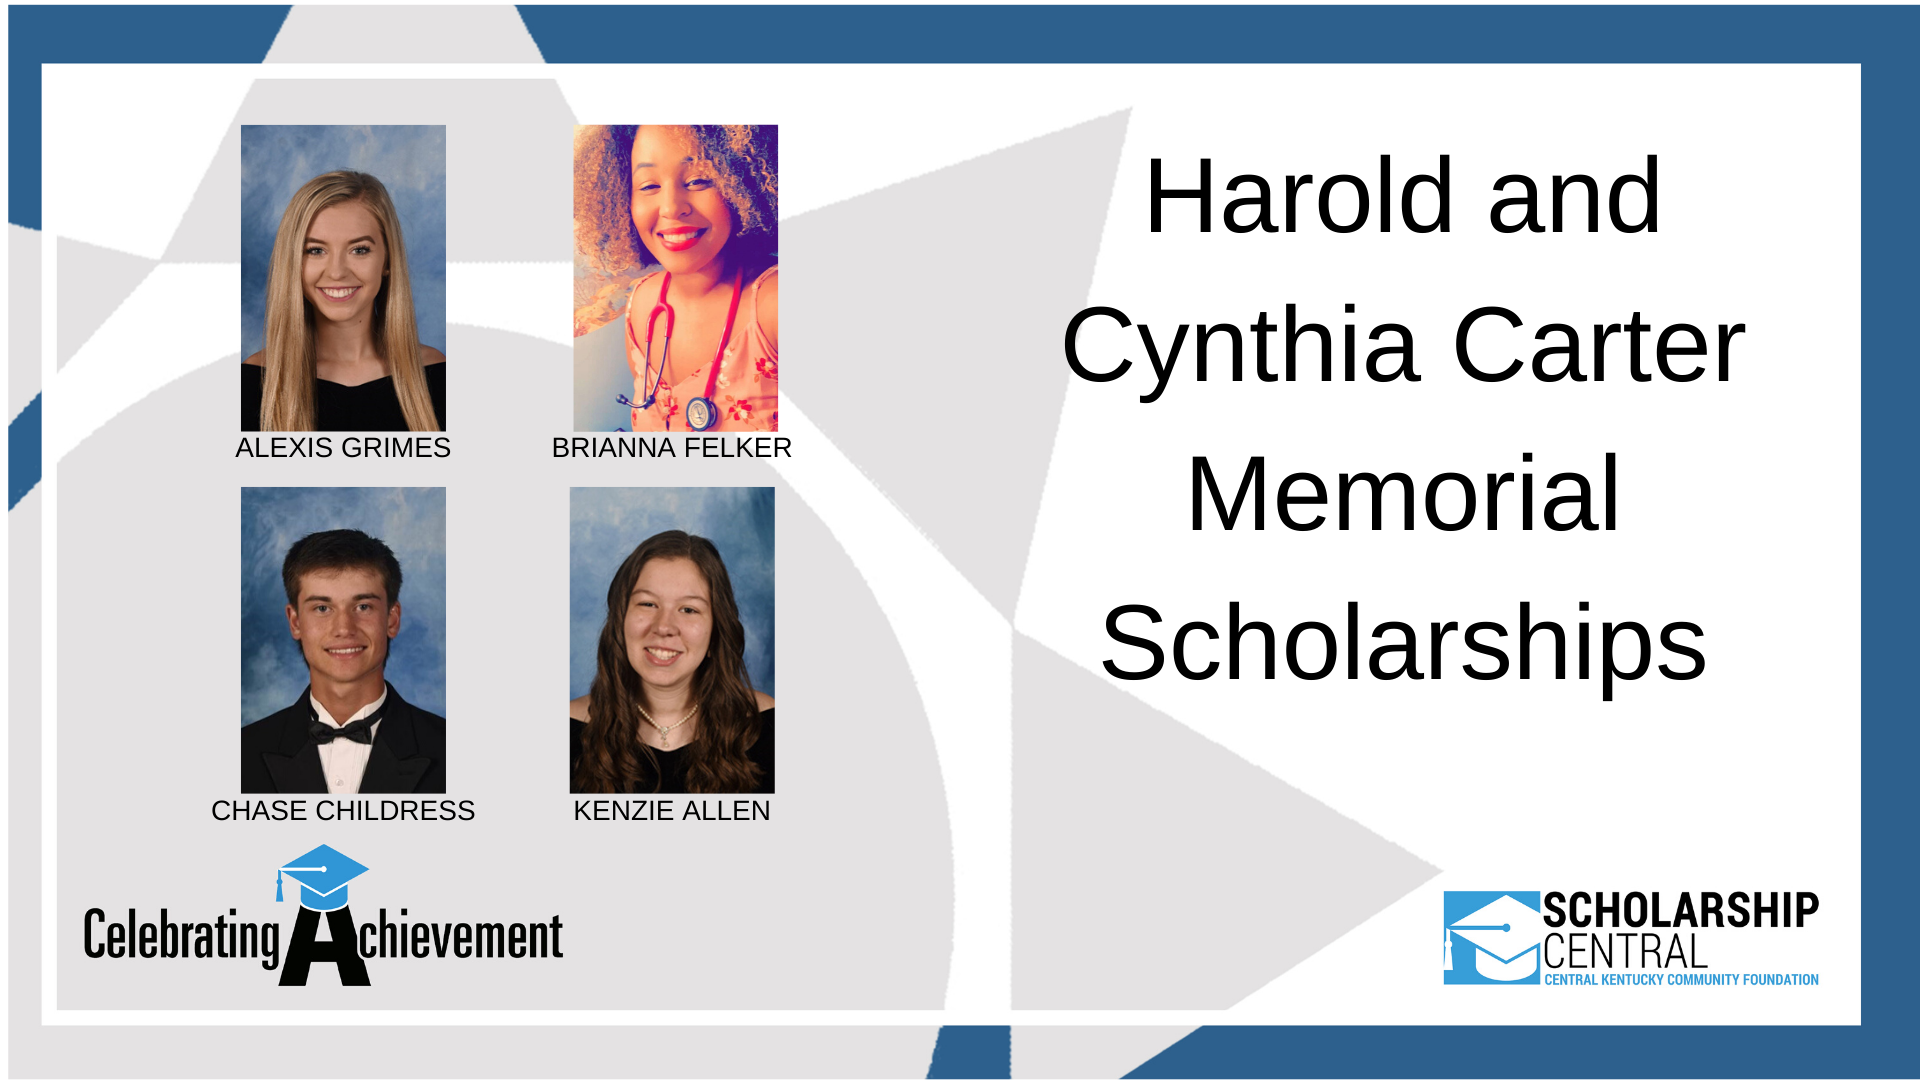 Harold And Cynthia Carter Scholarship1